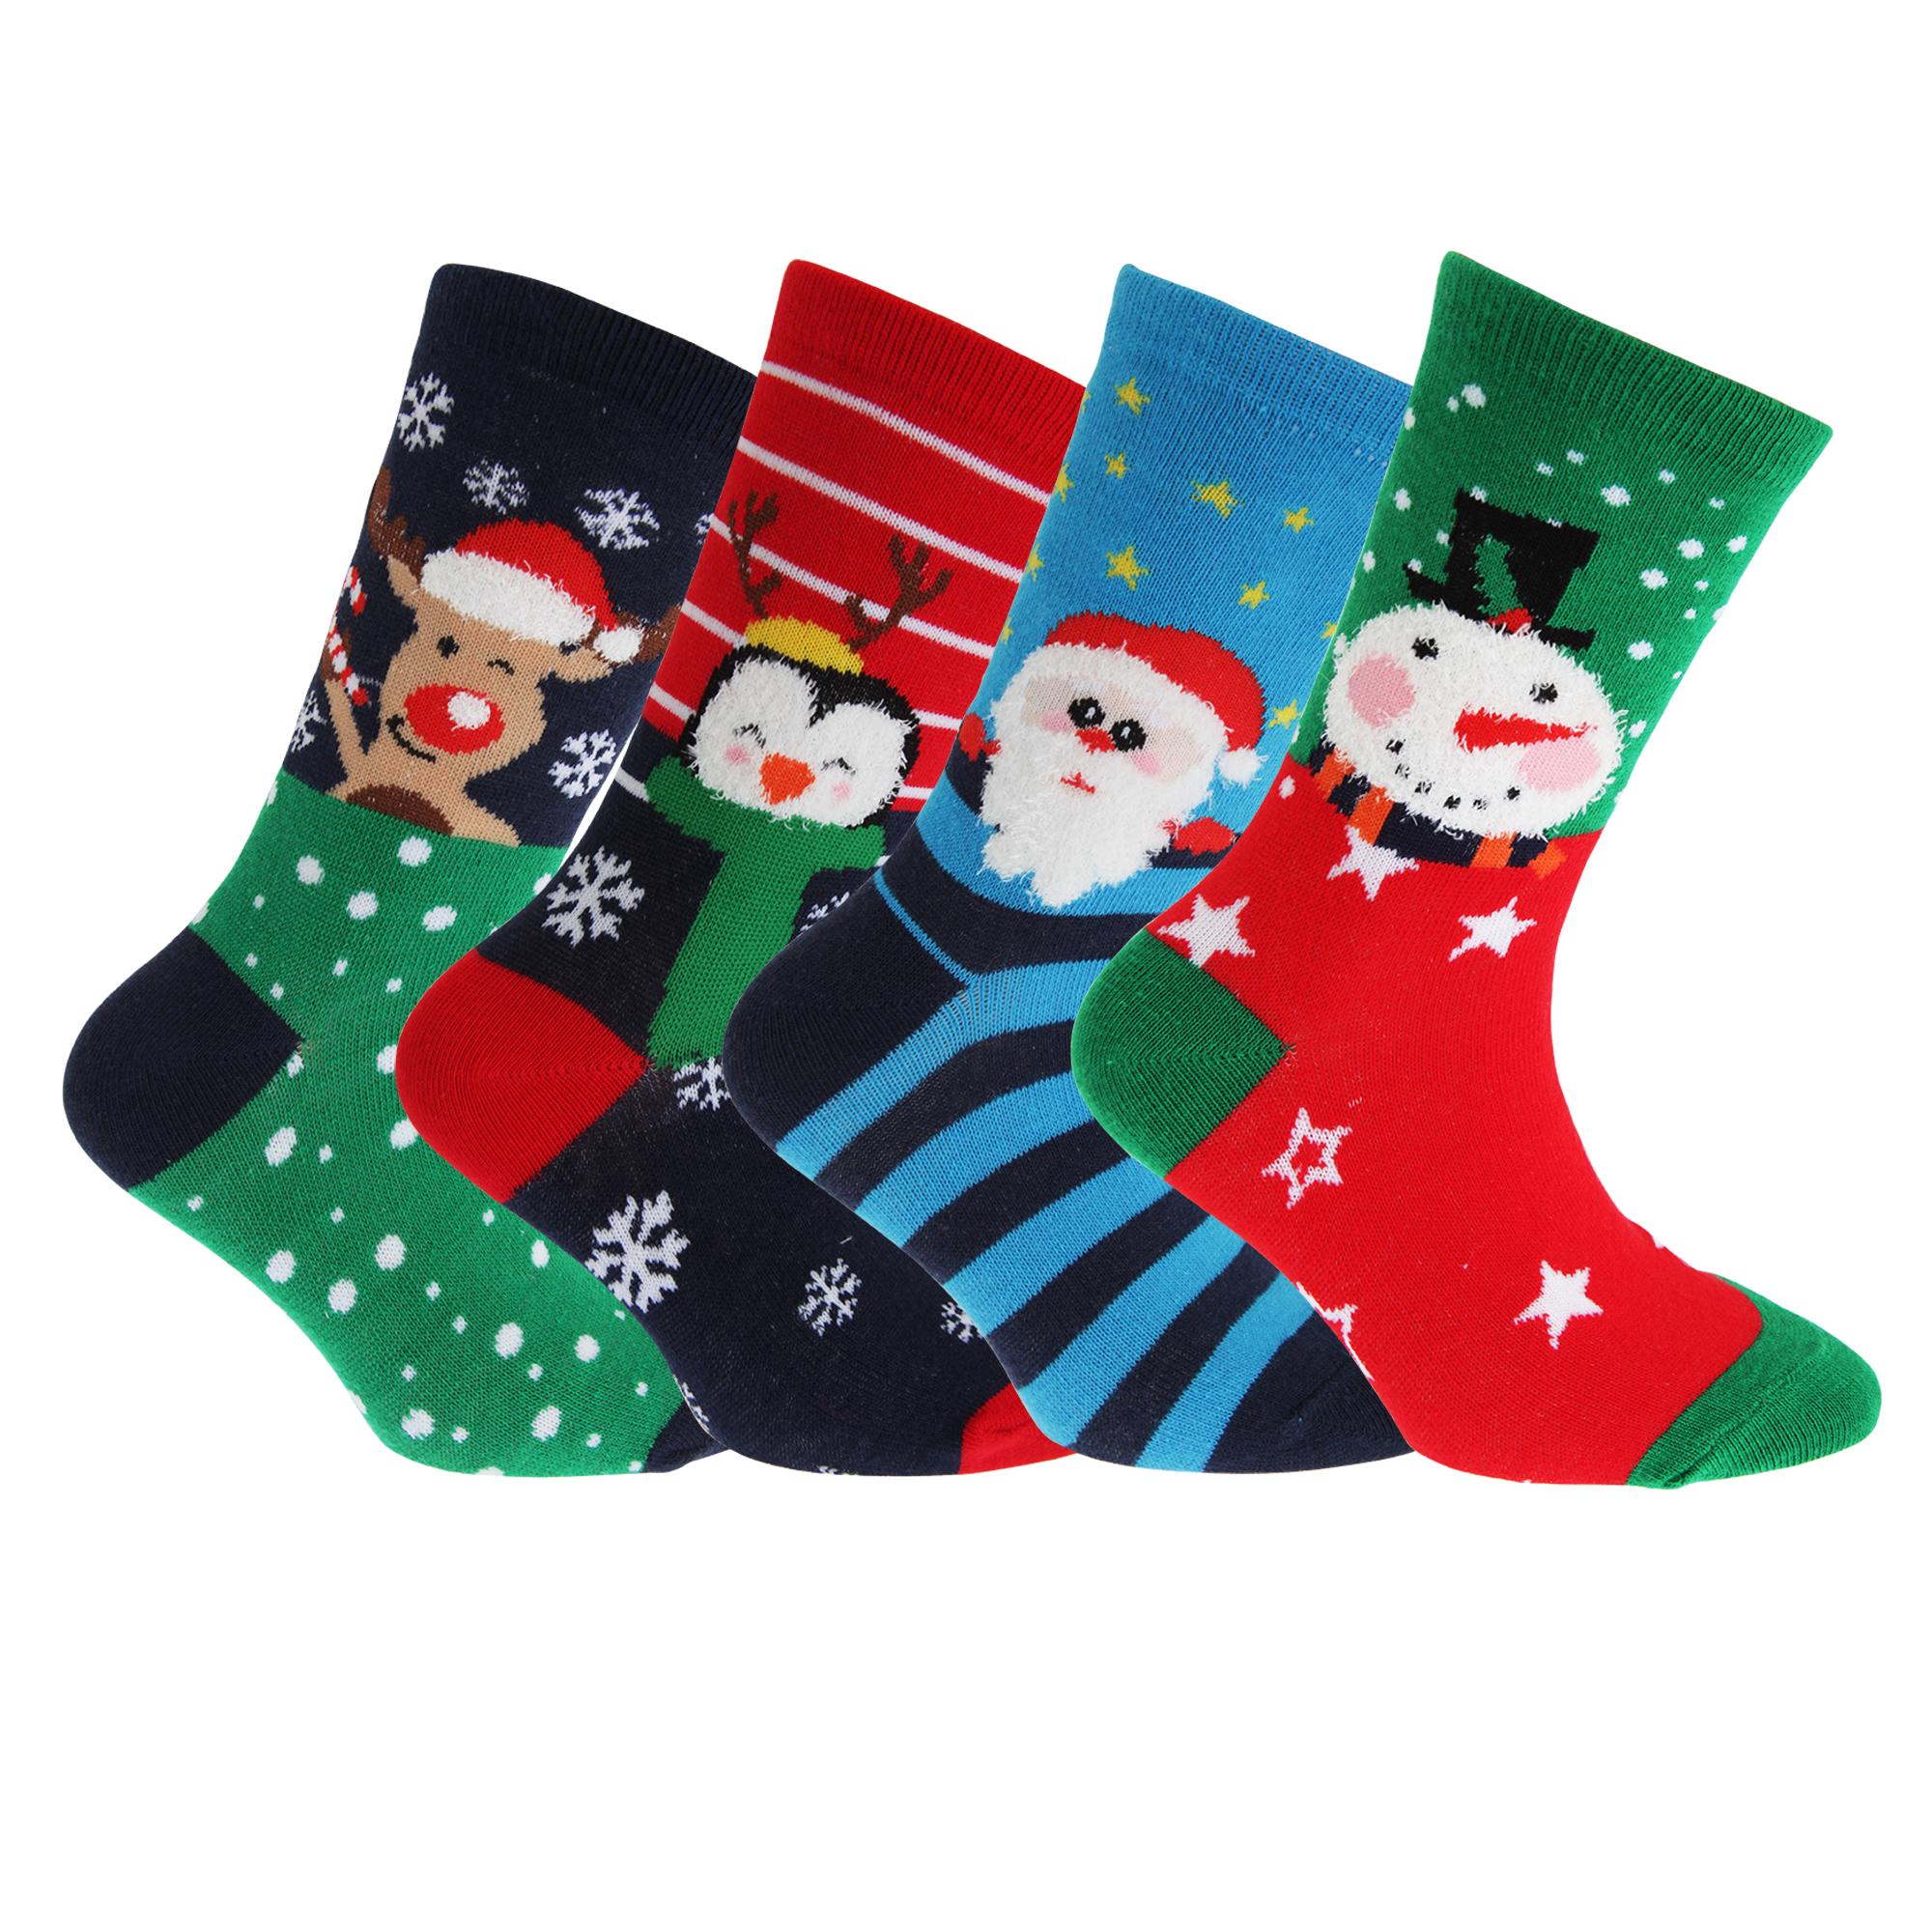 FLOSO Childrens/Kids Christmas Character Design Socks (4 Pairs ...